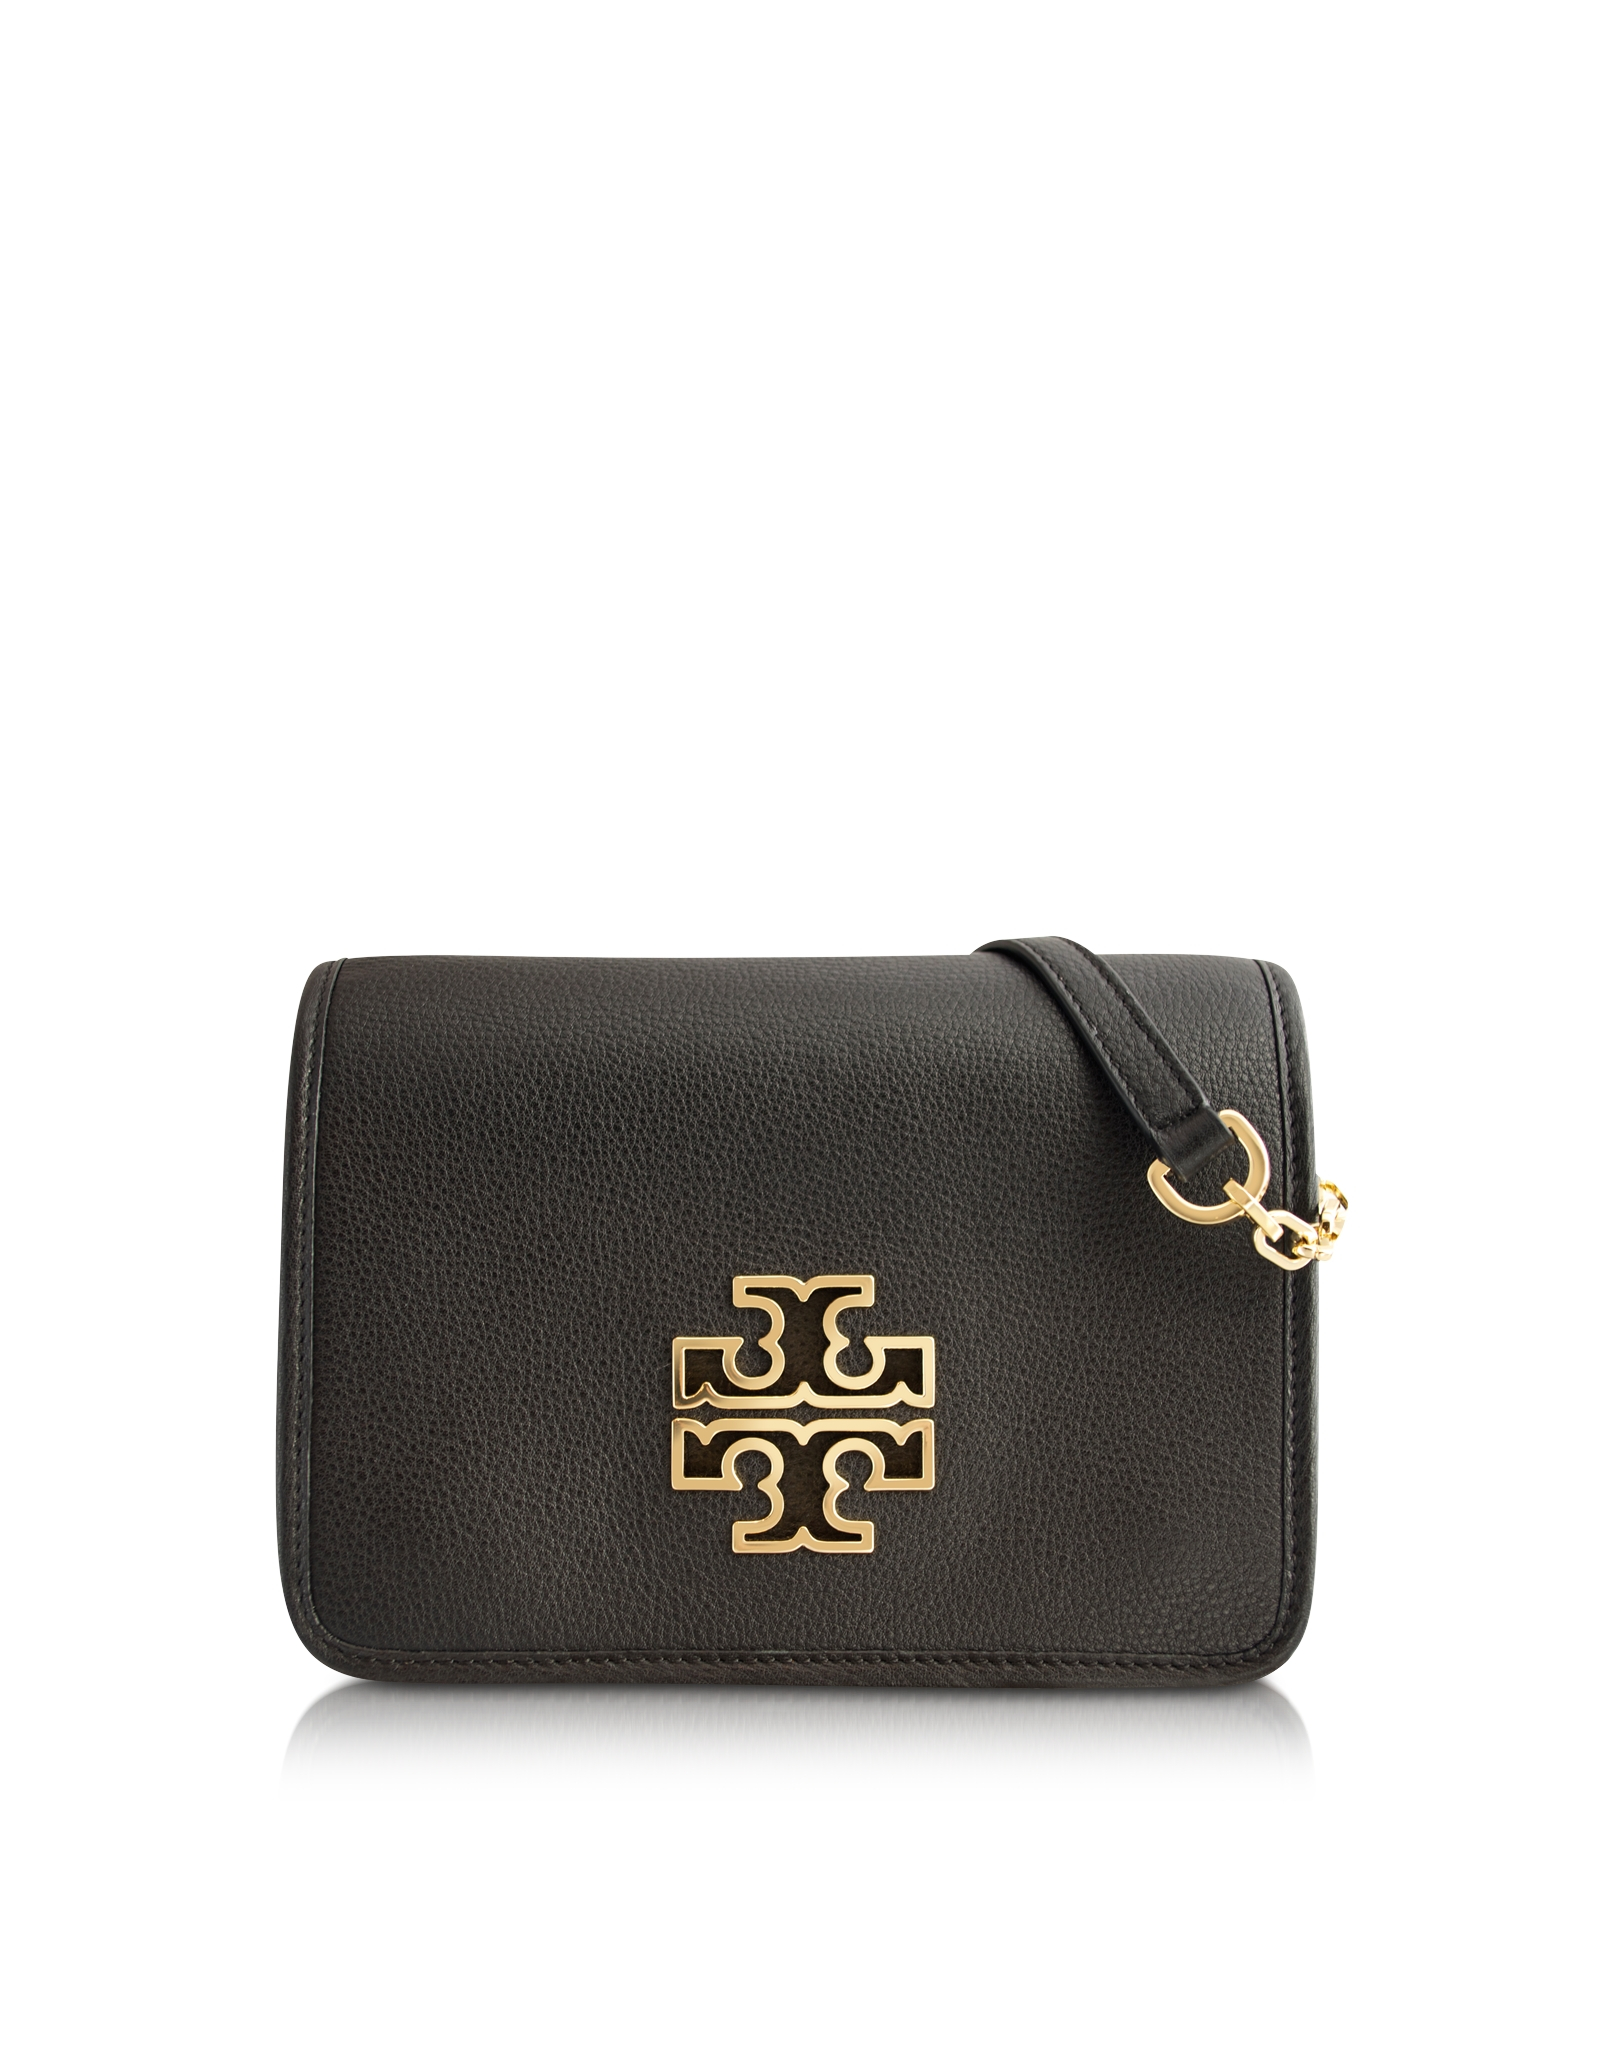 1532fa4cbeee Lyst - Tory Burch Britten Combo Crossbody Bag in Black